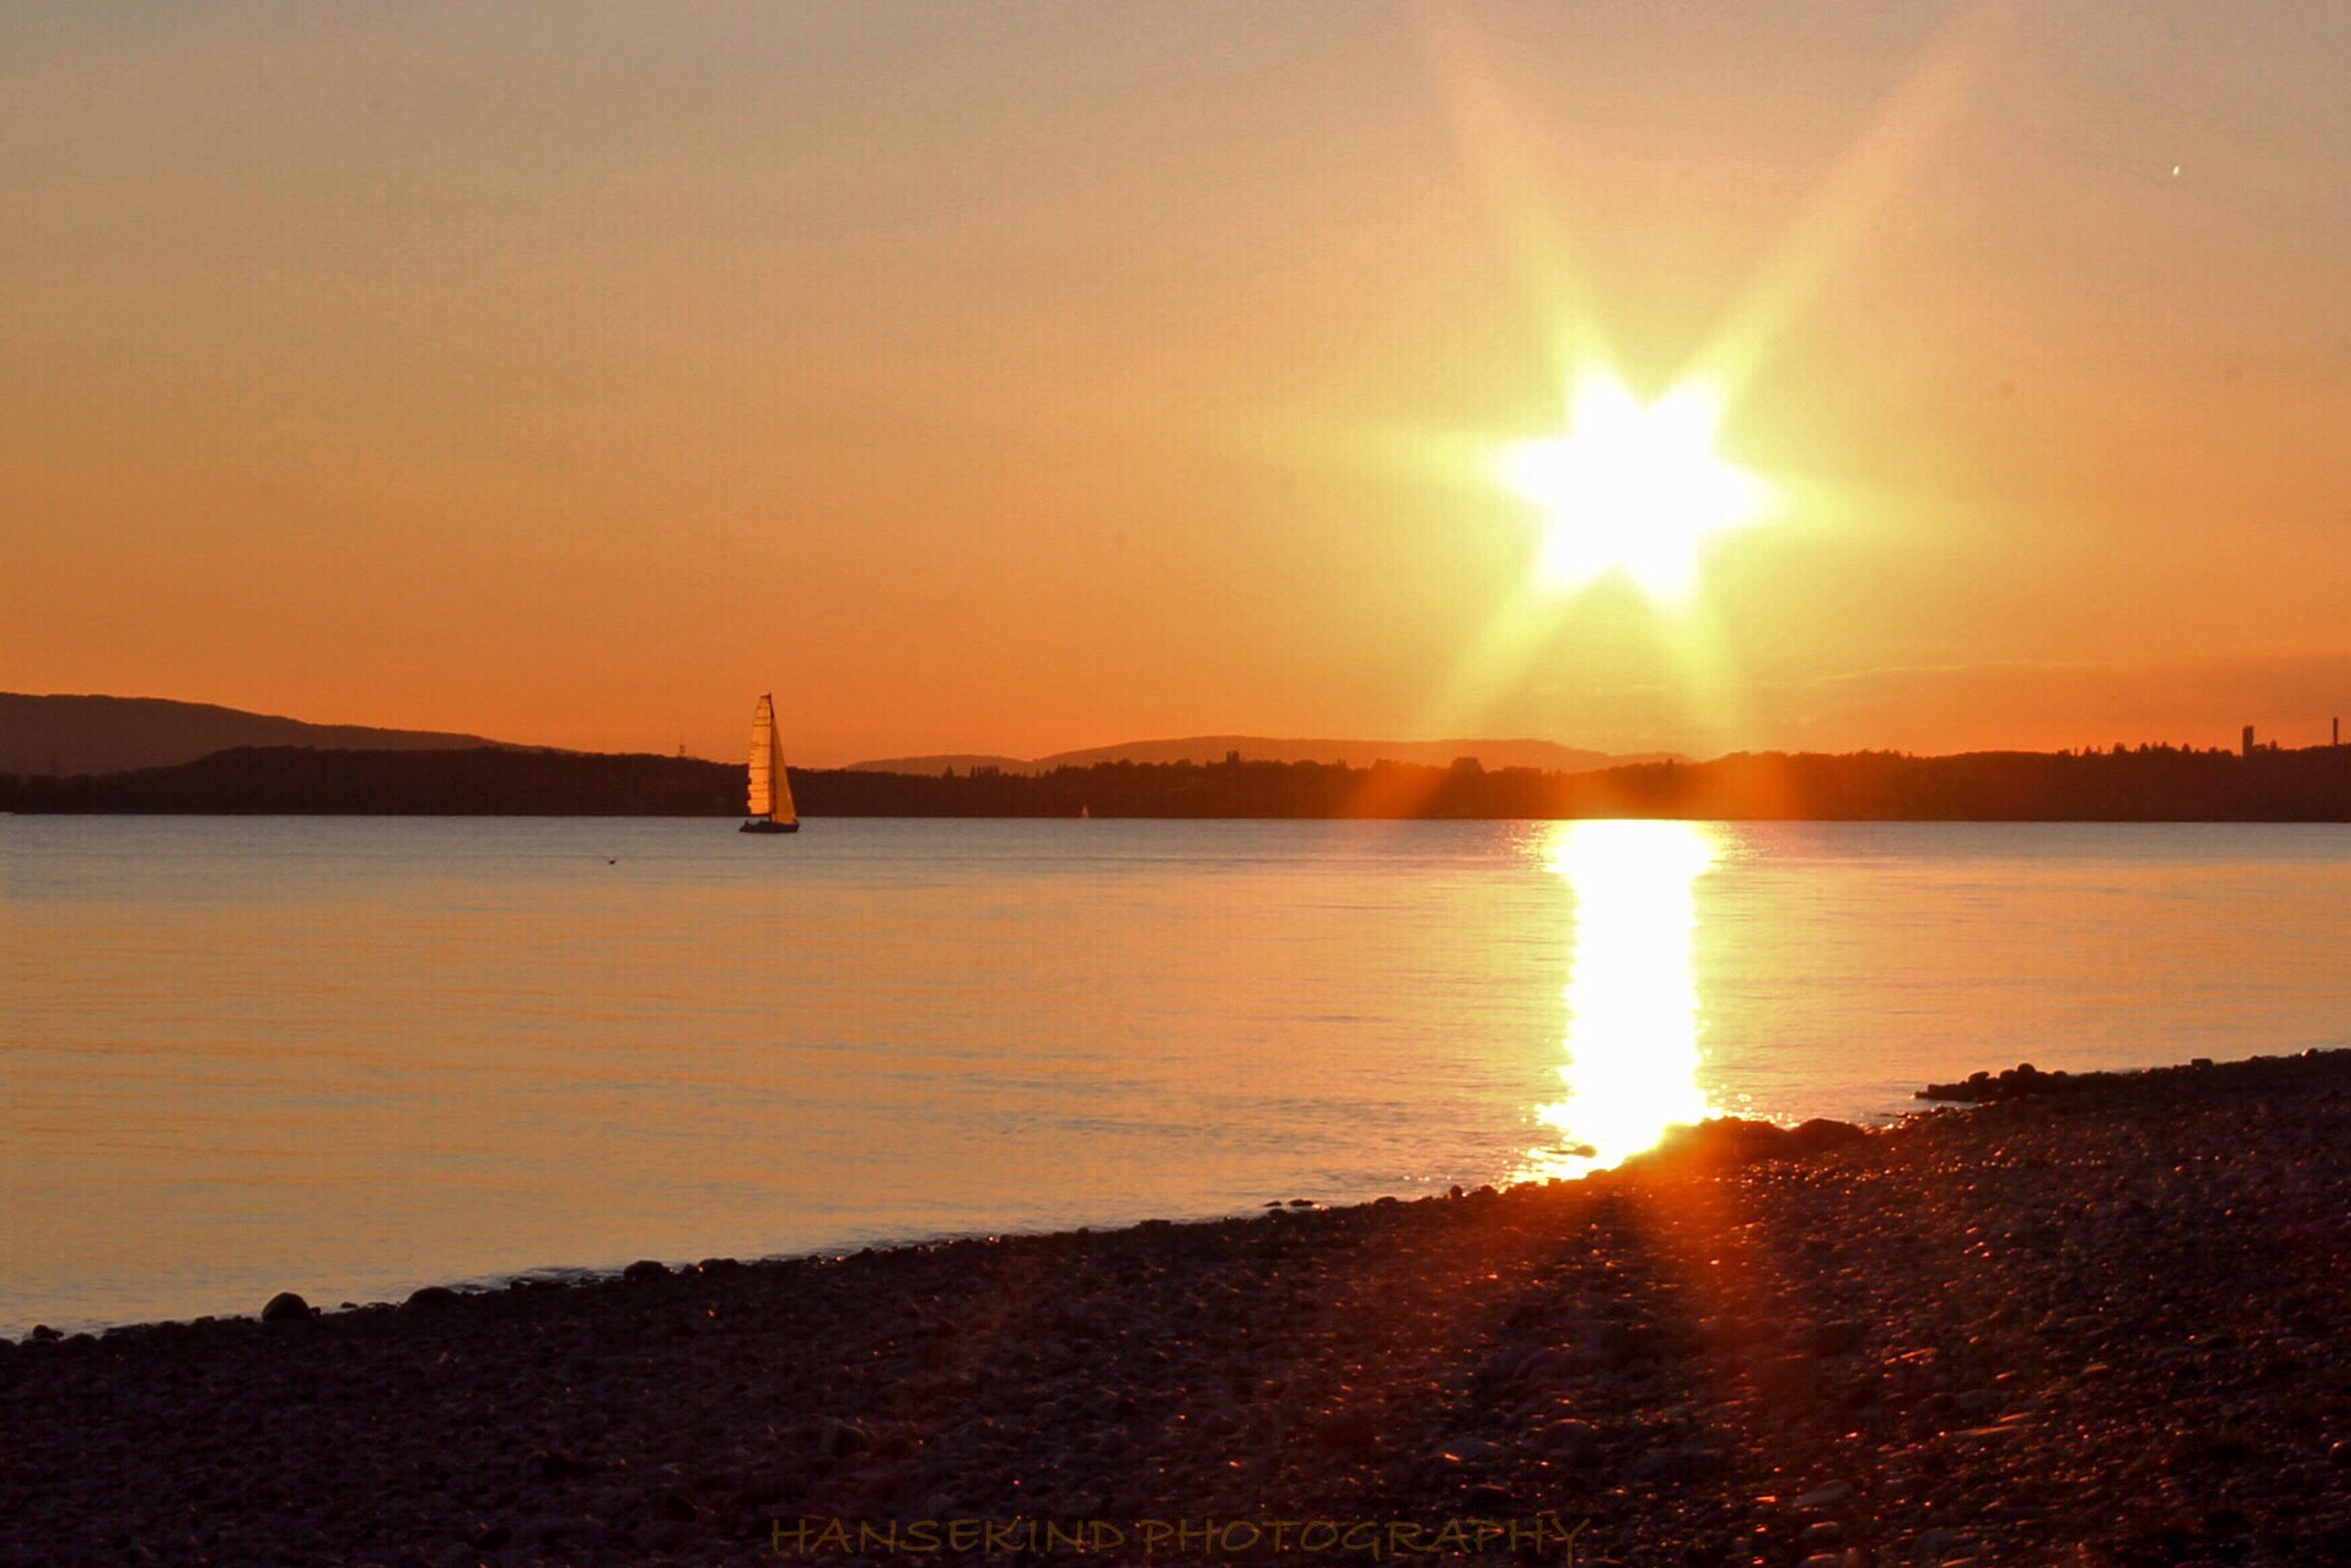 sun, sunset, water, scenics, tranquil scene, mountain, tranquility, sunlight, beauty in nature, sunbeam, orange color, lens flare, reflection, silhouette, nature, sea, idyllic, sky, beach, clear sky